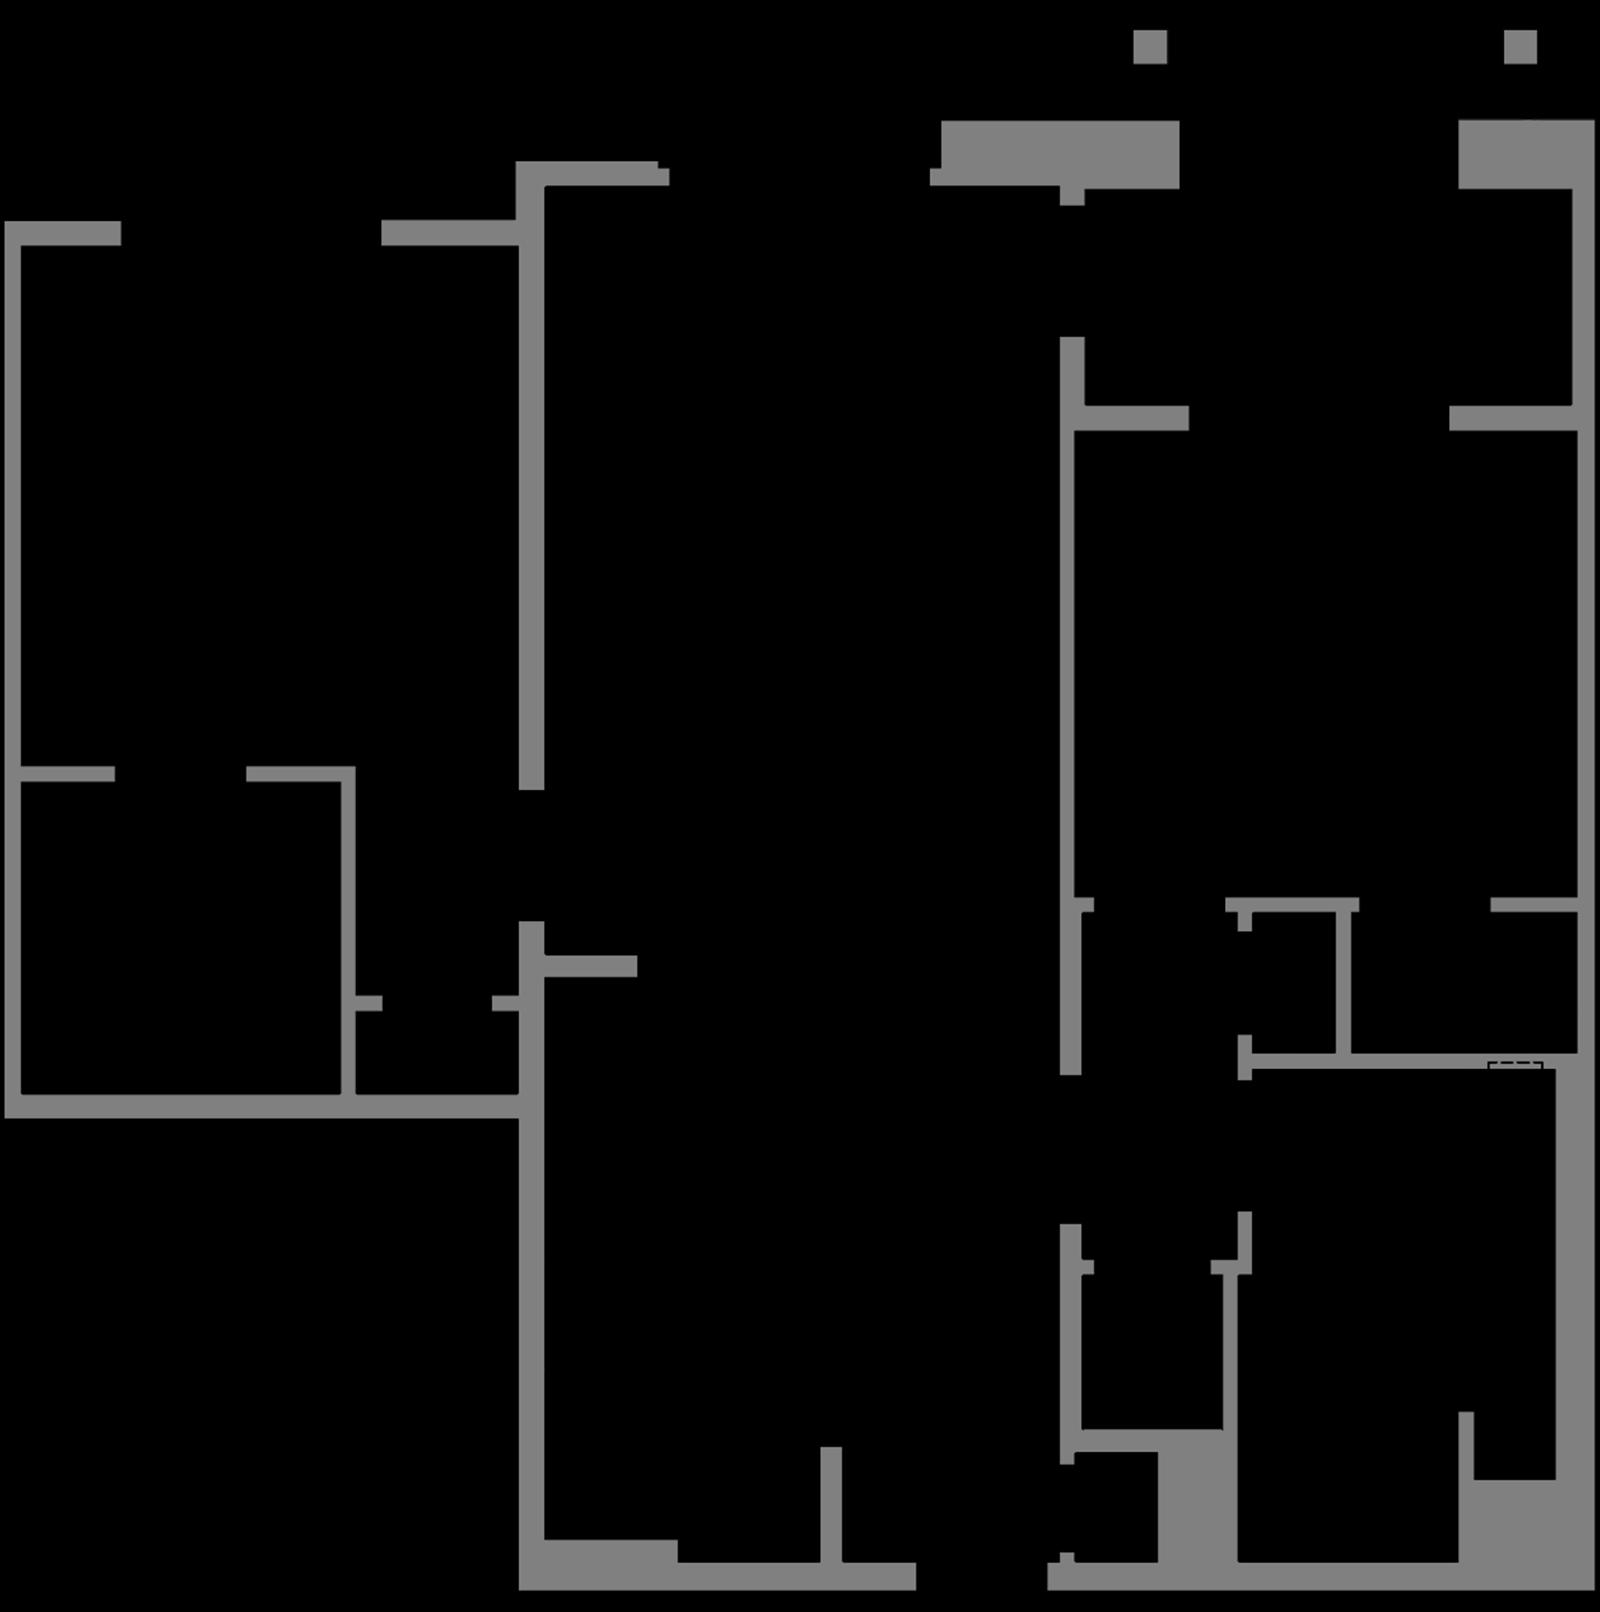 Plan B6 - 2 Bedroom, 1 Bath Floor Plan